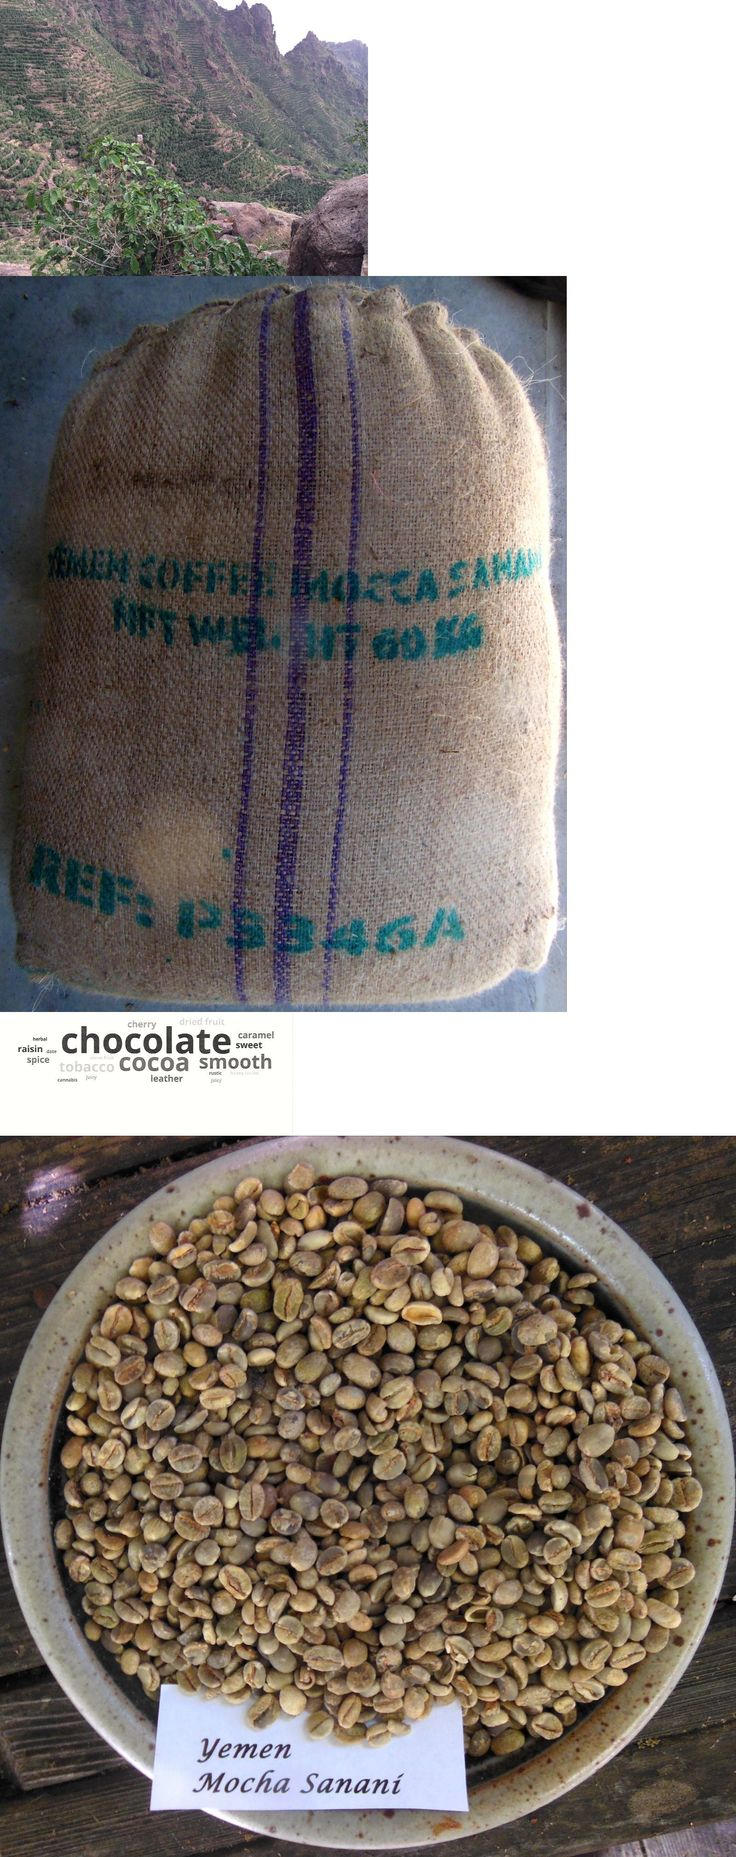 Coffee Beans 38179: 4 Lbs Yemen Mocha Sanani Un-Roasted Green Coffee Bean Only Ones On Ebay -> BUY IT NOW ONLY: $45 on eBay!